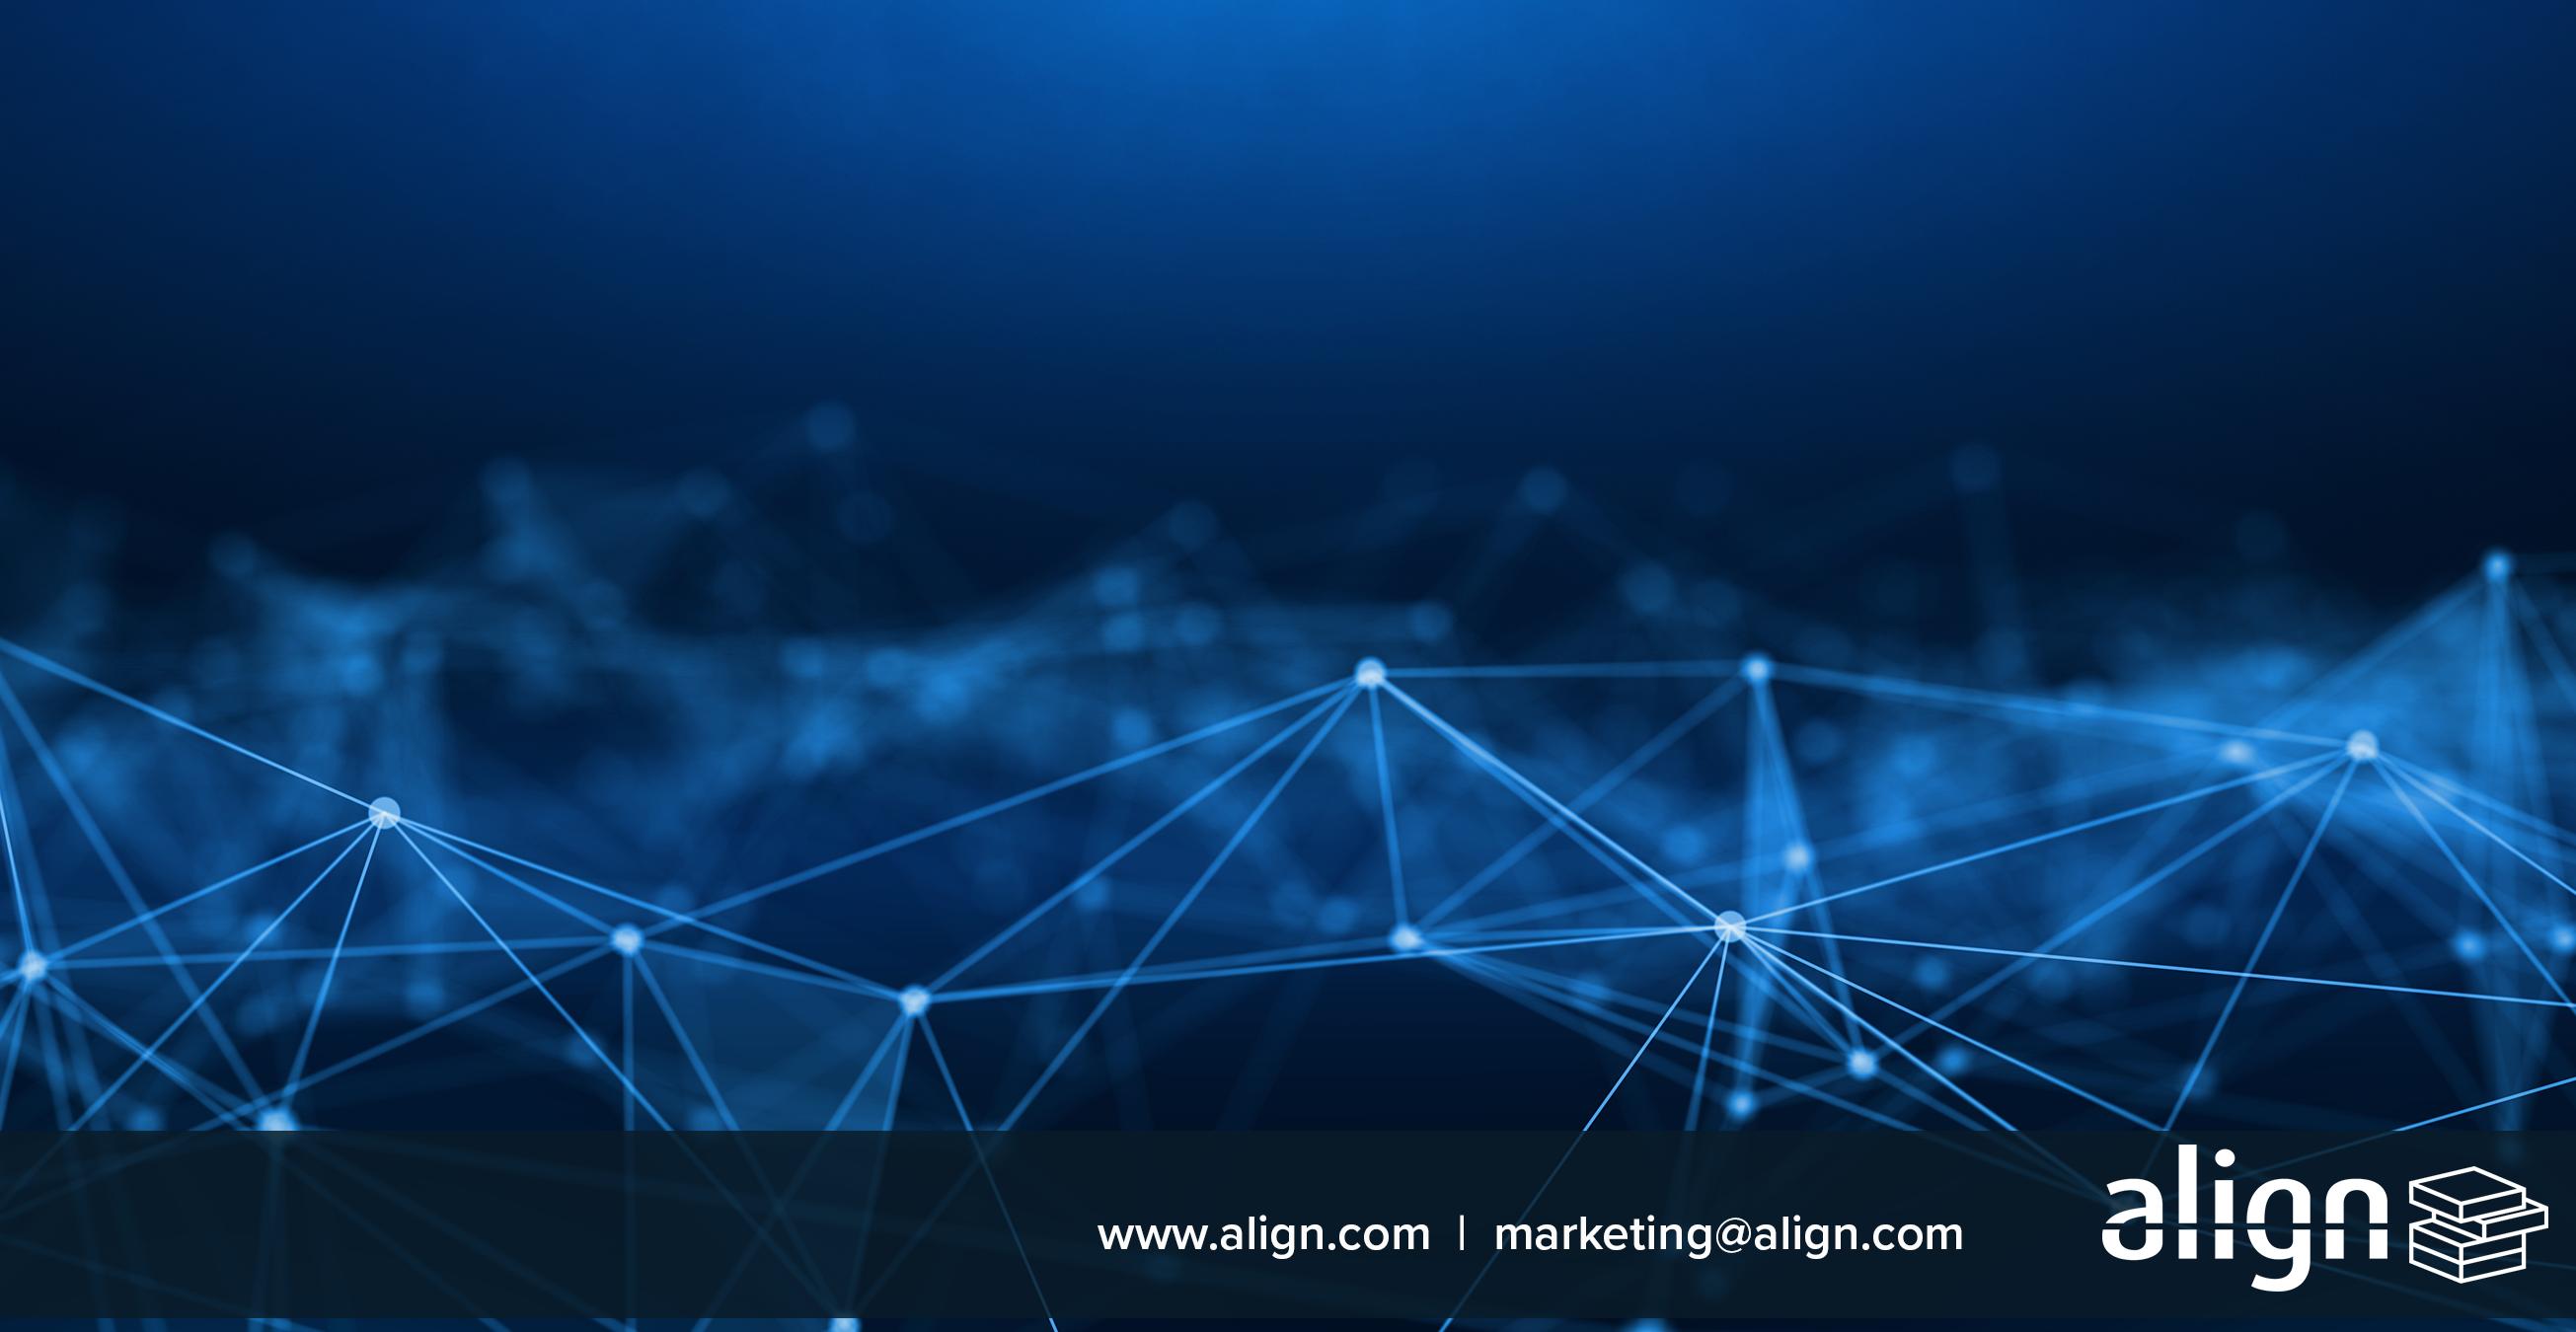 AdobeStock_138539919_Align_Network_IT_v3